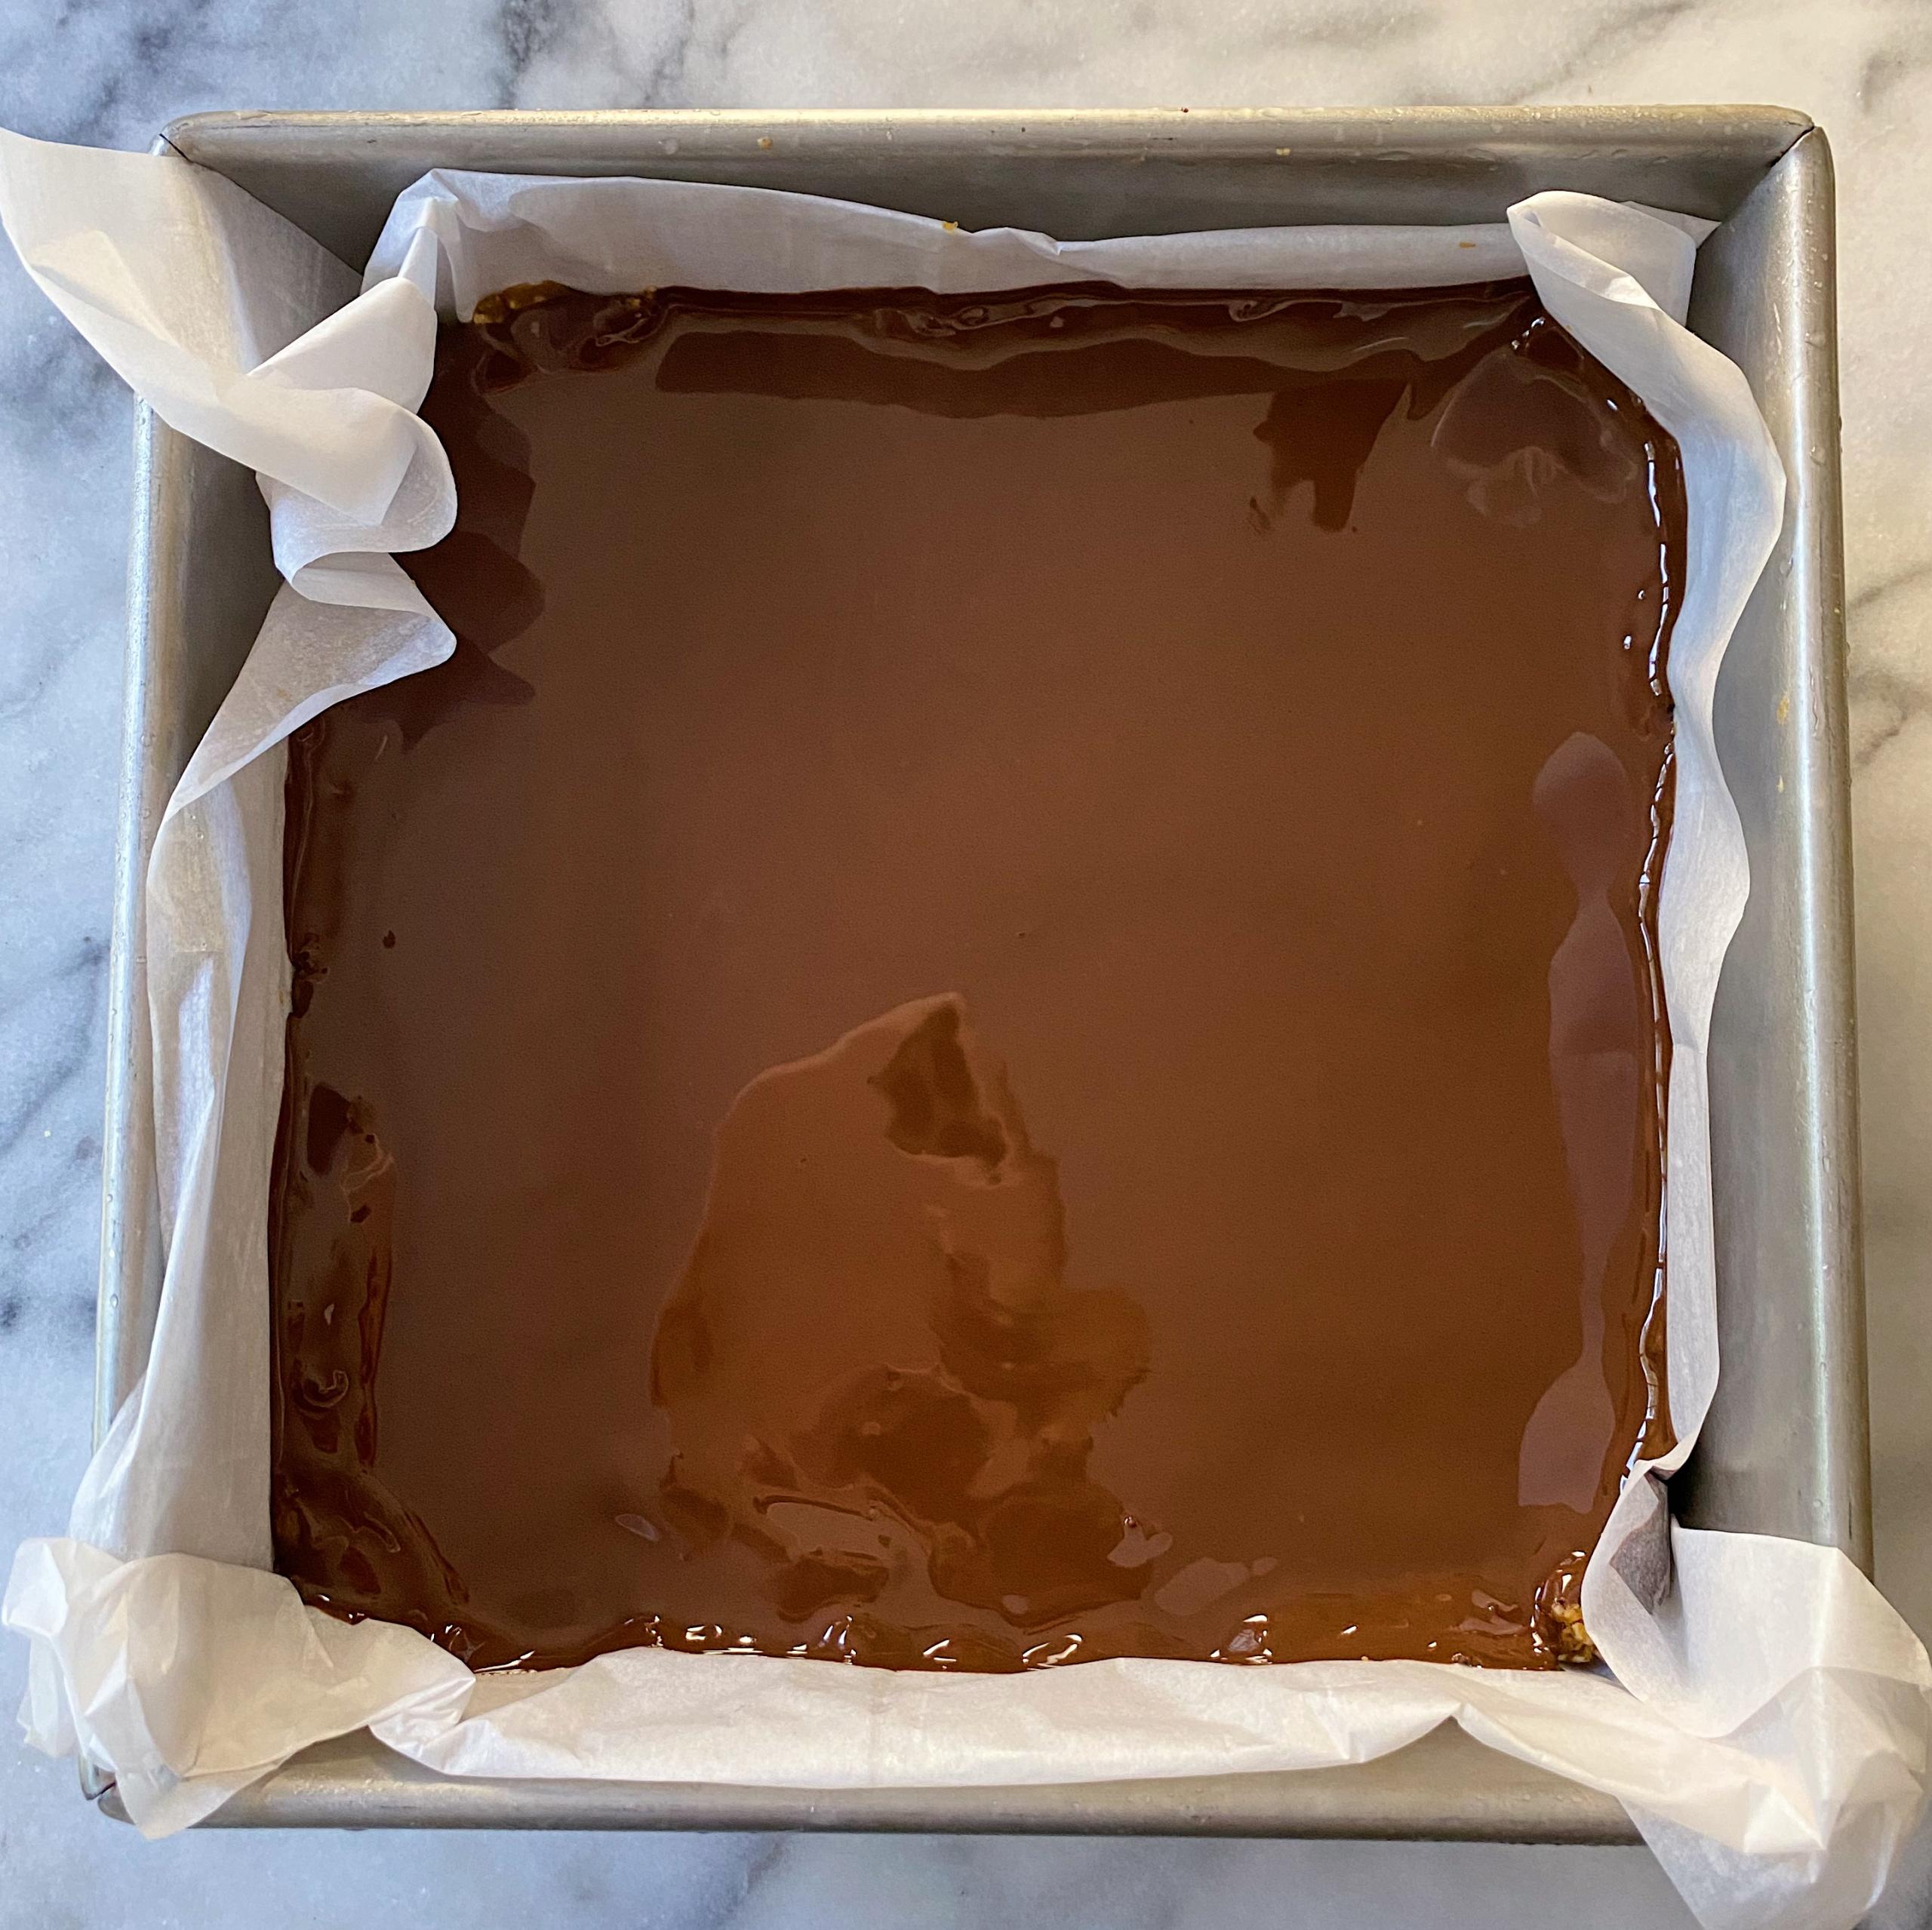 Pumpkin Chocolate No Bake Bars gluten free www.healthygffamily.com